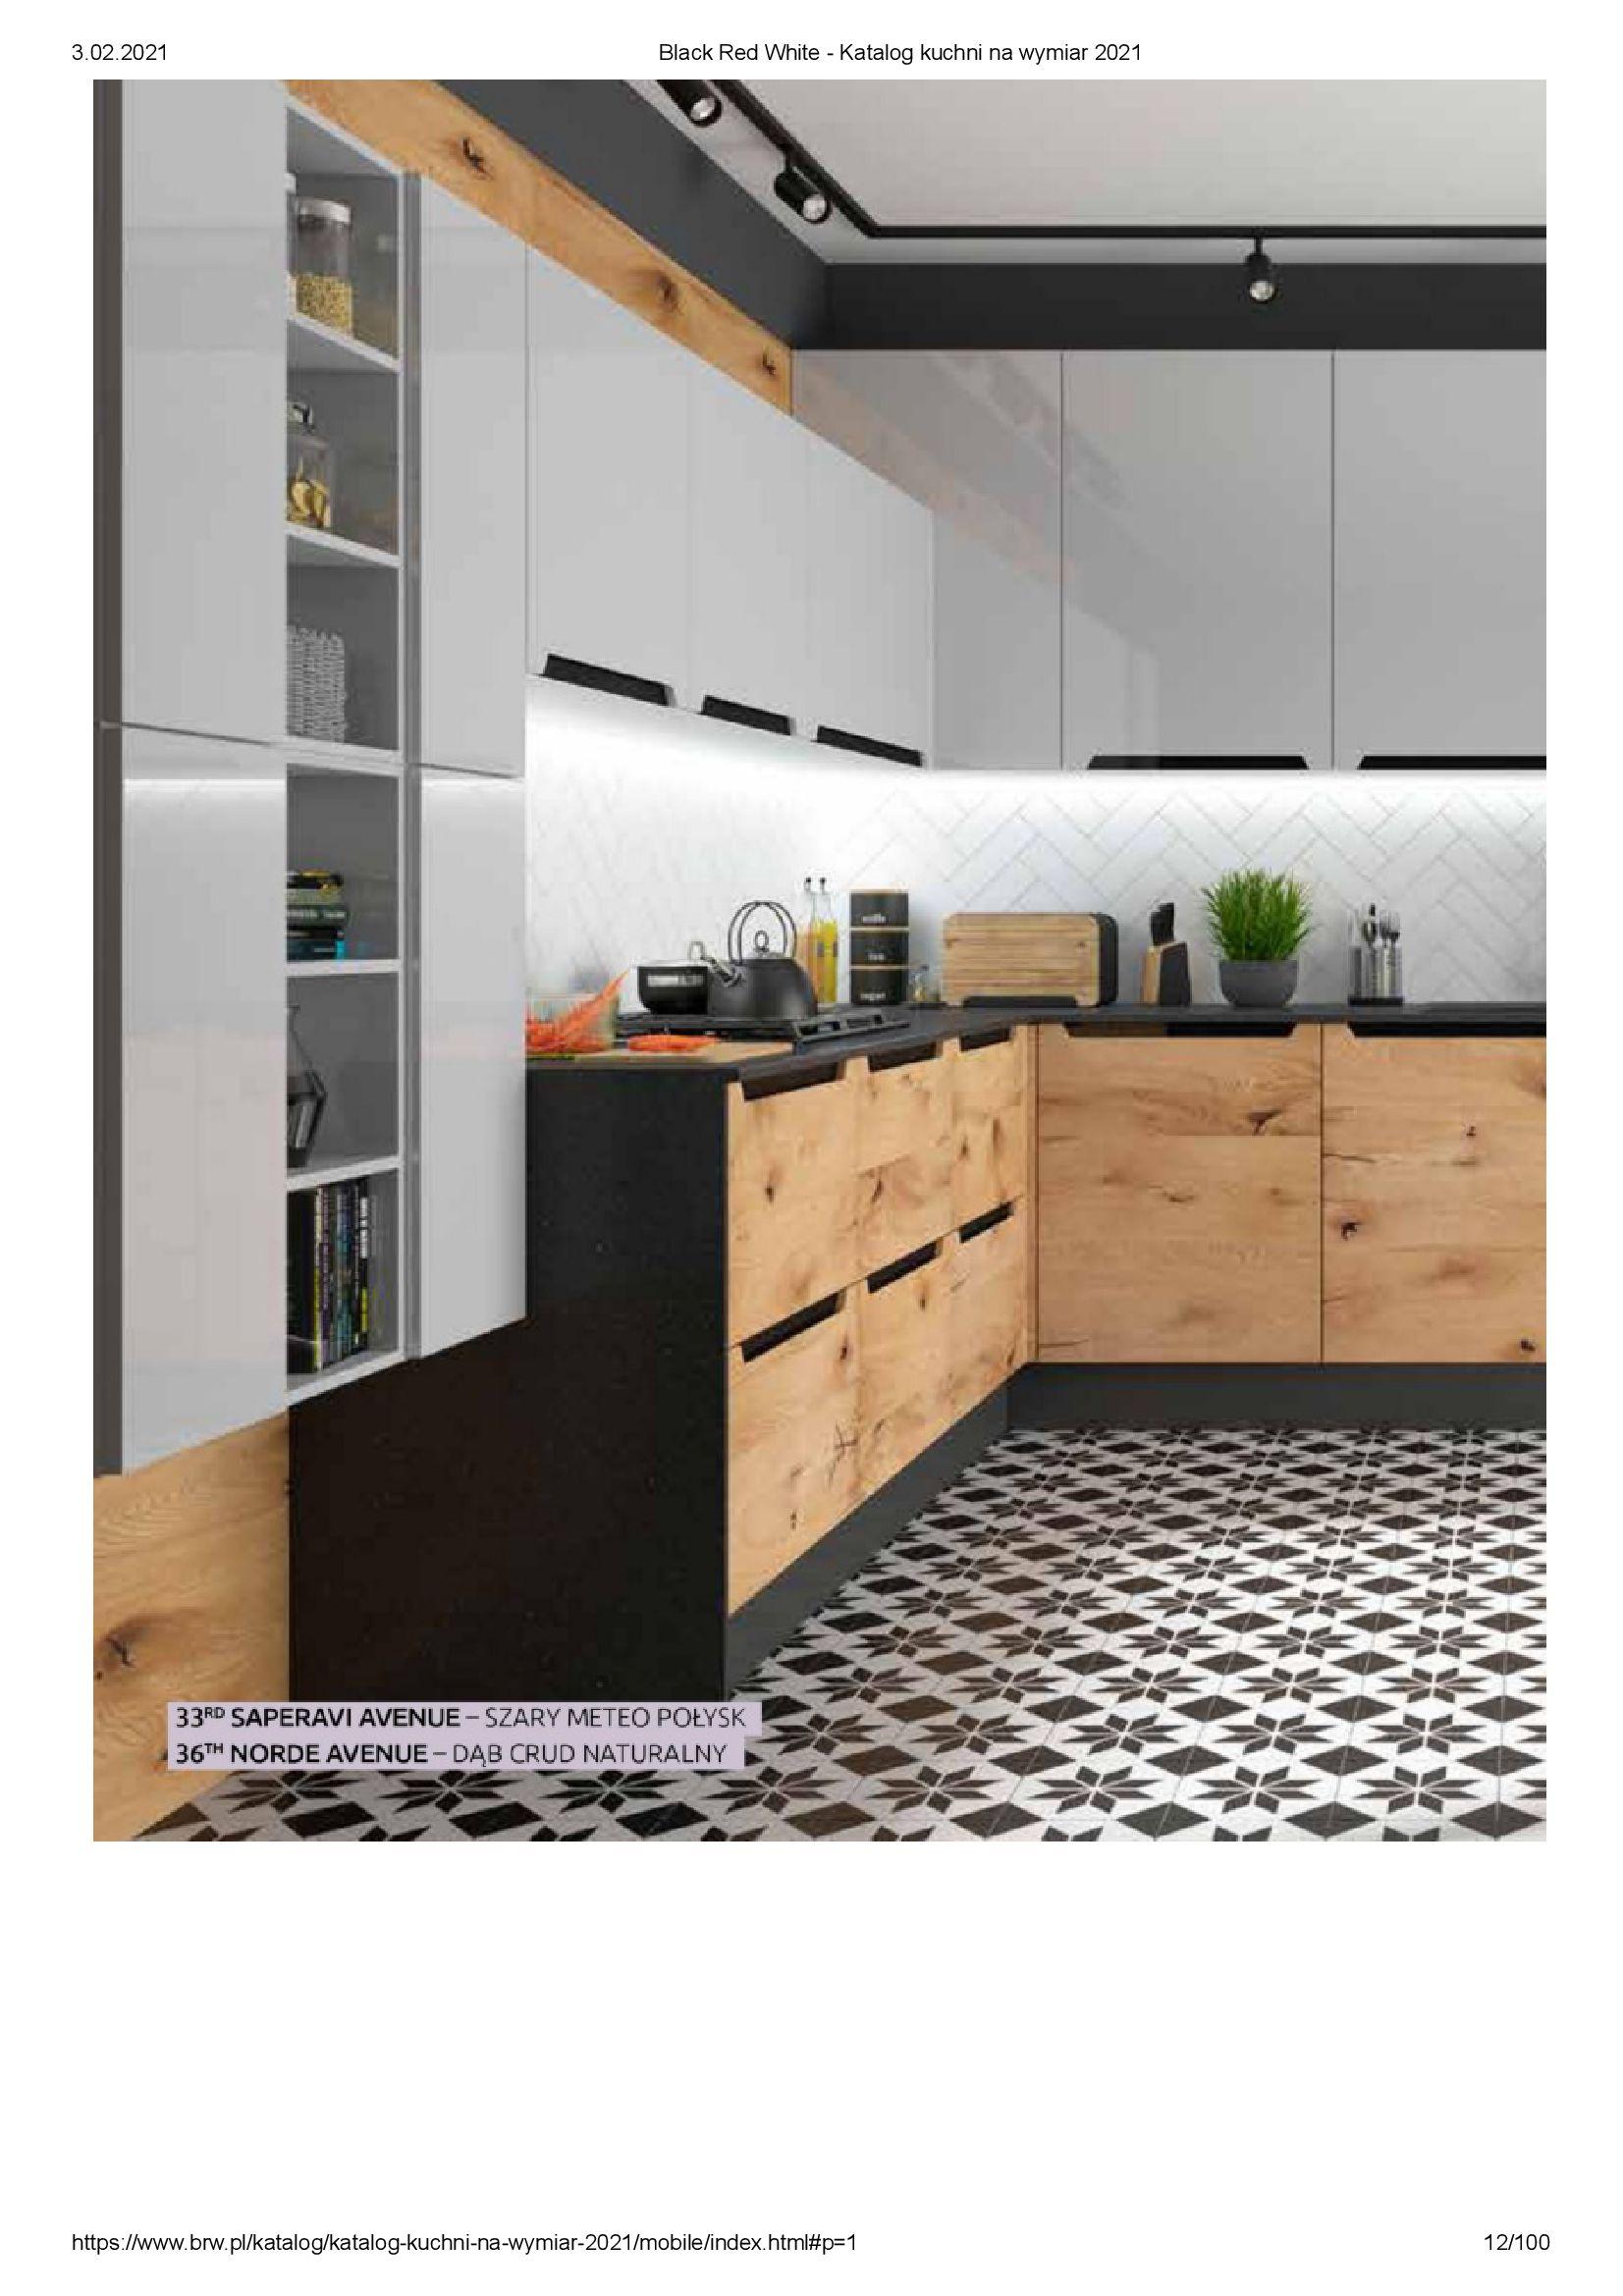 Gazetka Black Red White: Katalog - Kuchnie na wymiar Senso Kitchens 2021 2021-01-01 page-12